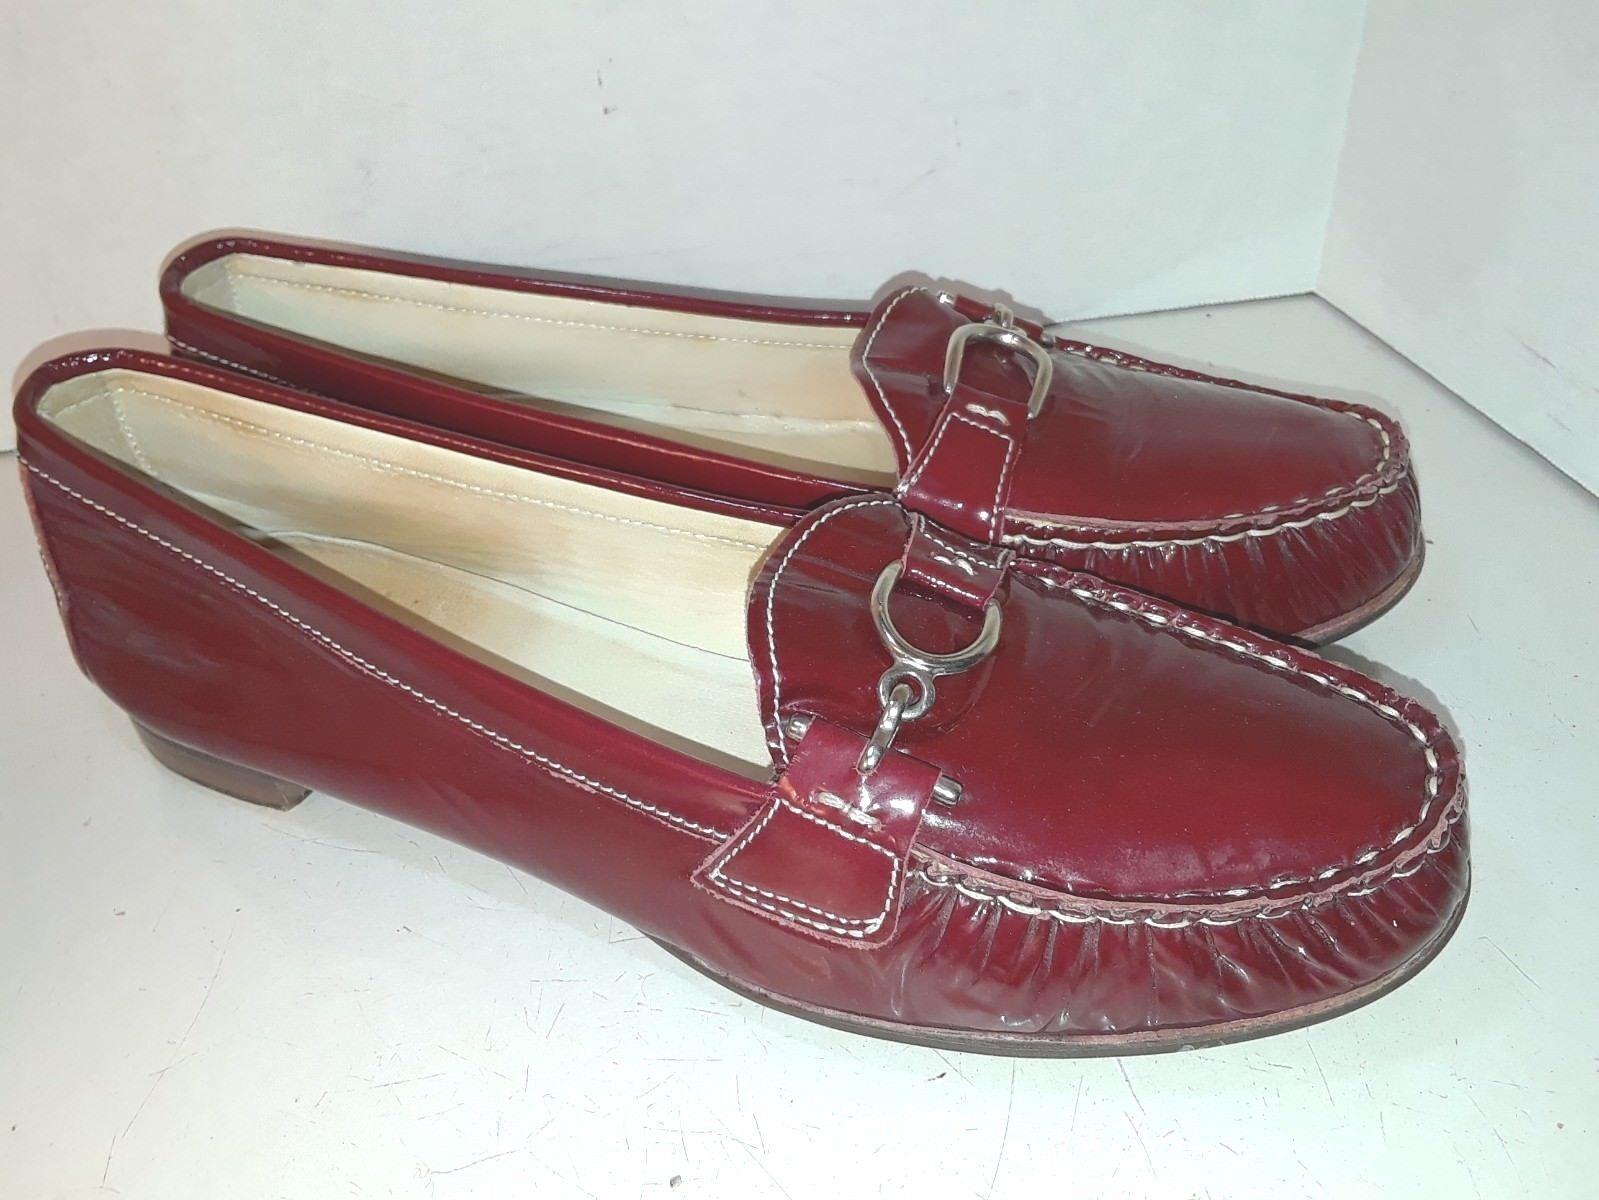 AGL Attilio Giusti Leombruni Red Patent Leather Loafers Slip On Womens Size 40.5